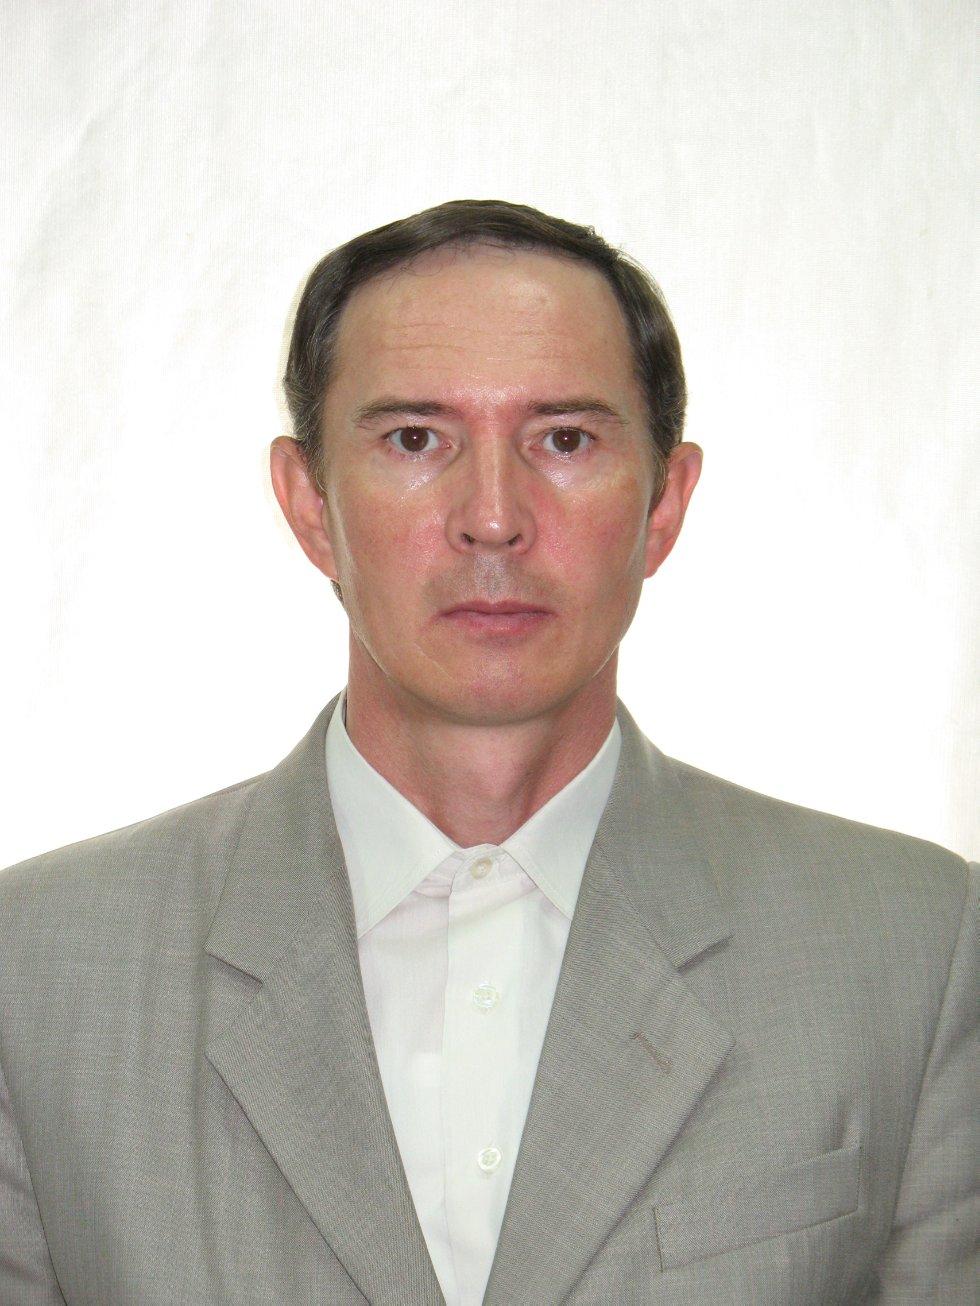 Фардеев Альберт Рифович